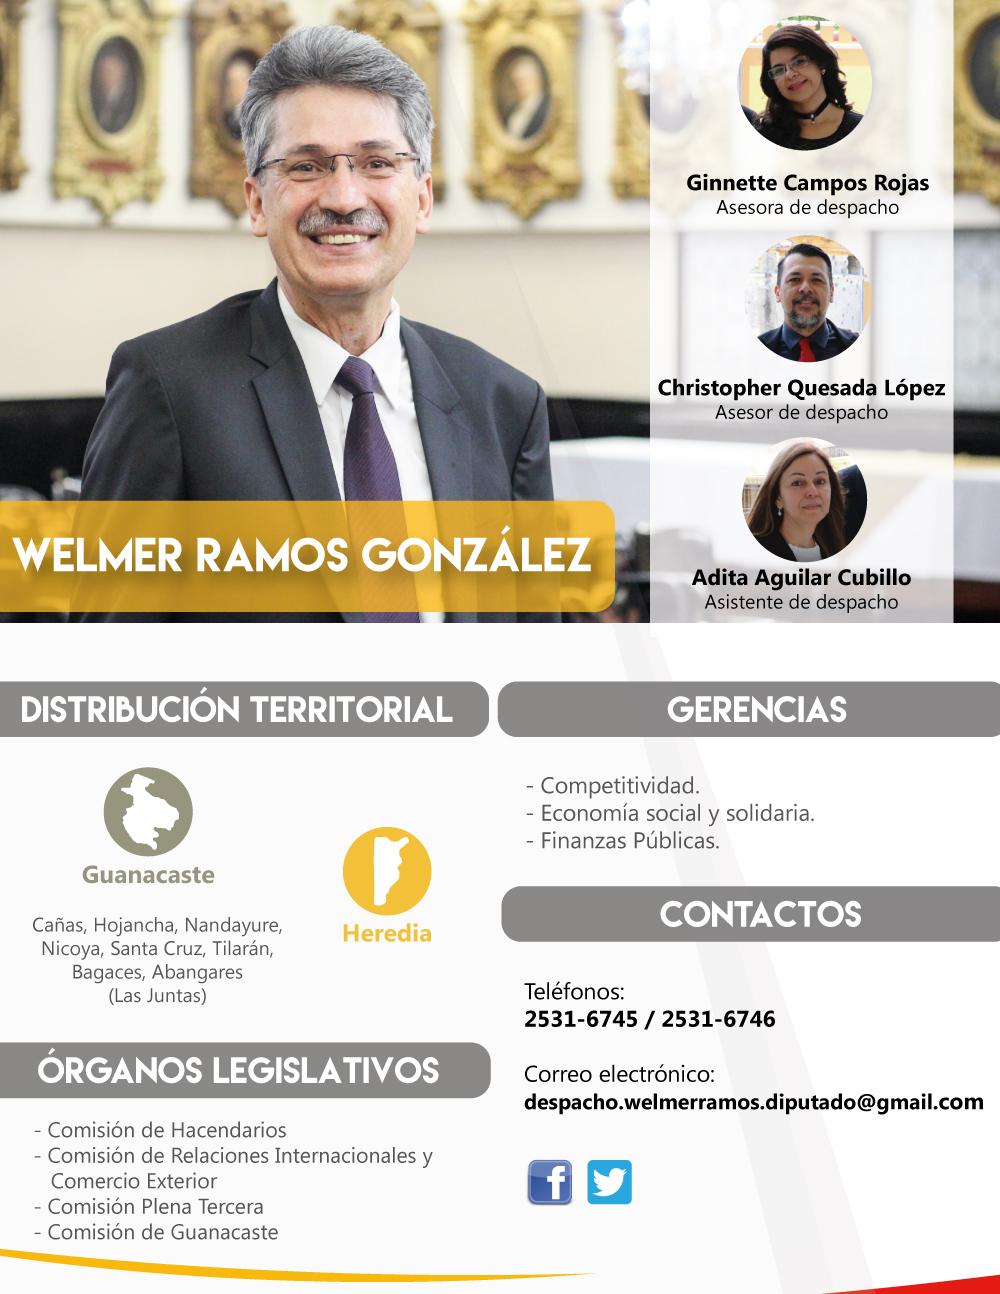 Despacho-Welmer-Ramos